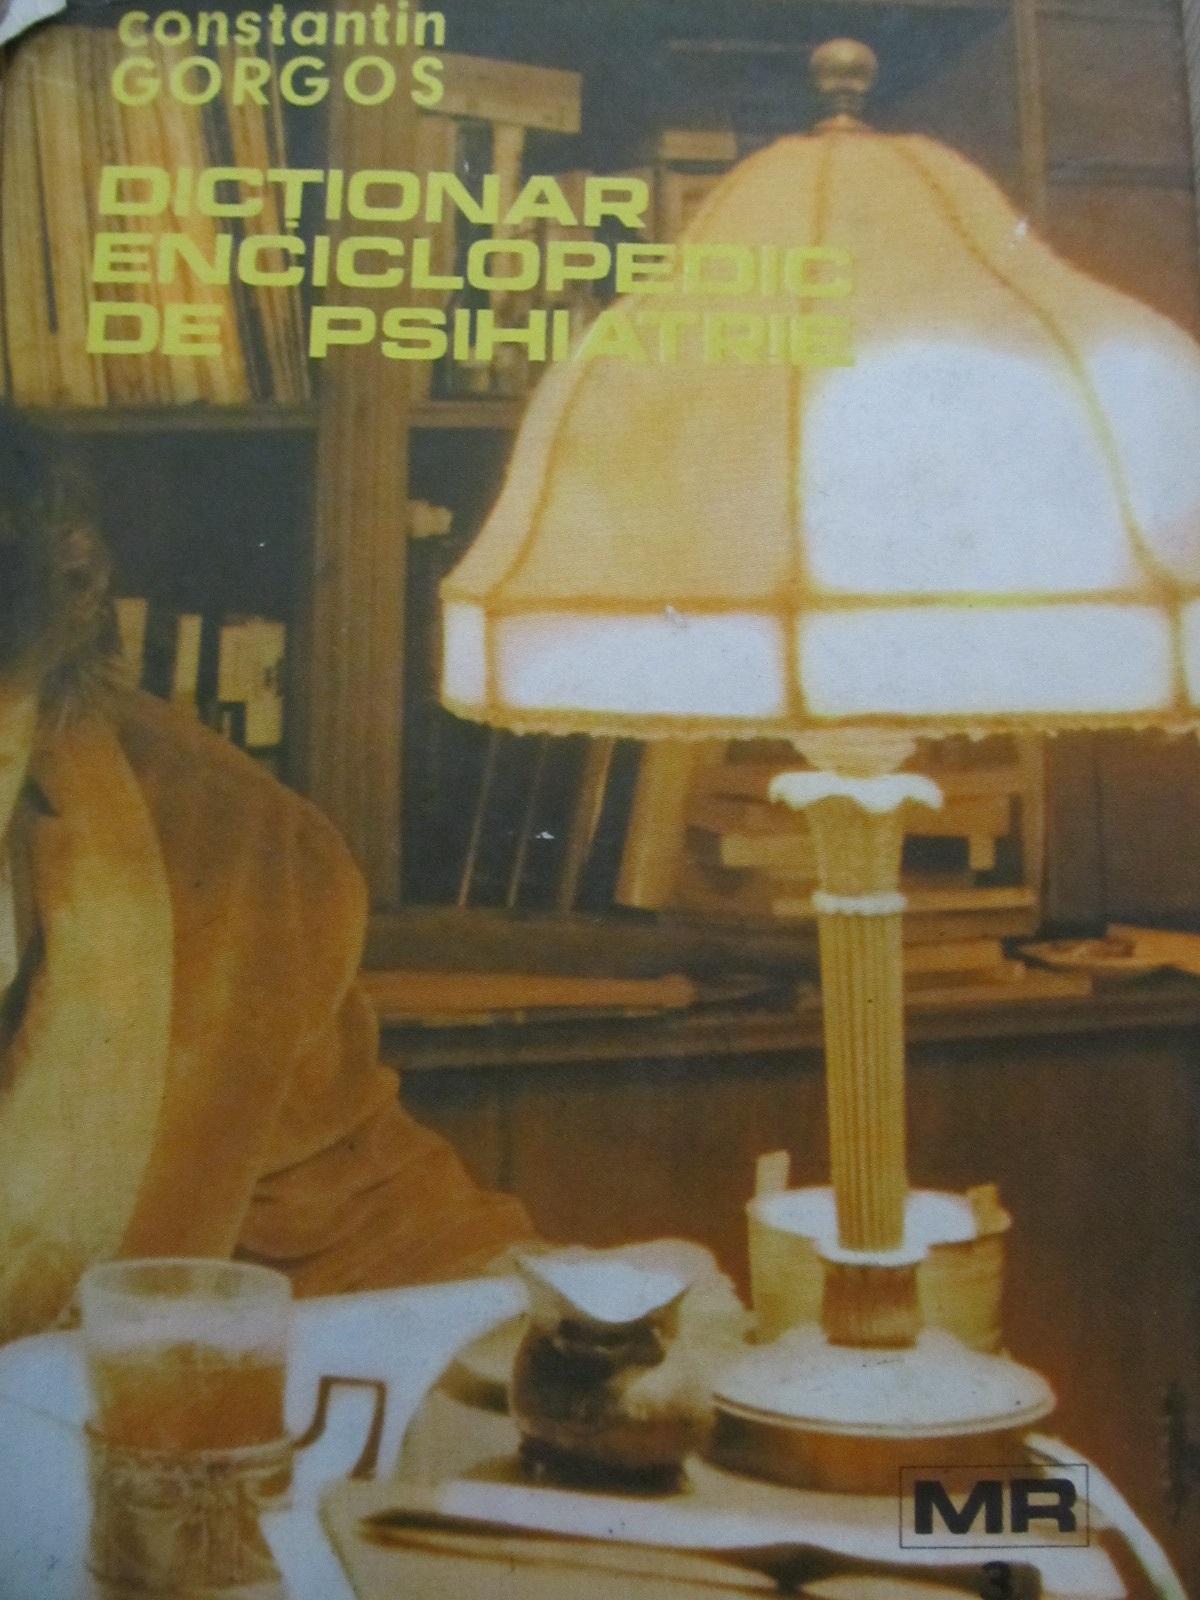 Dictionar enciclopedic de psihiatrie M - R (vol. 3) - Constantin Gorgos | Detalii carte